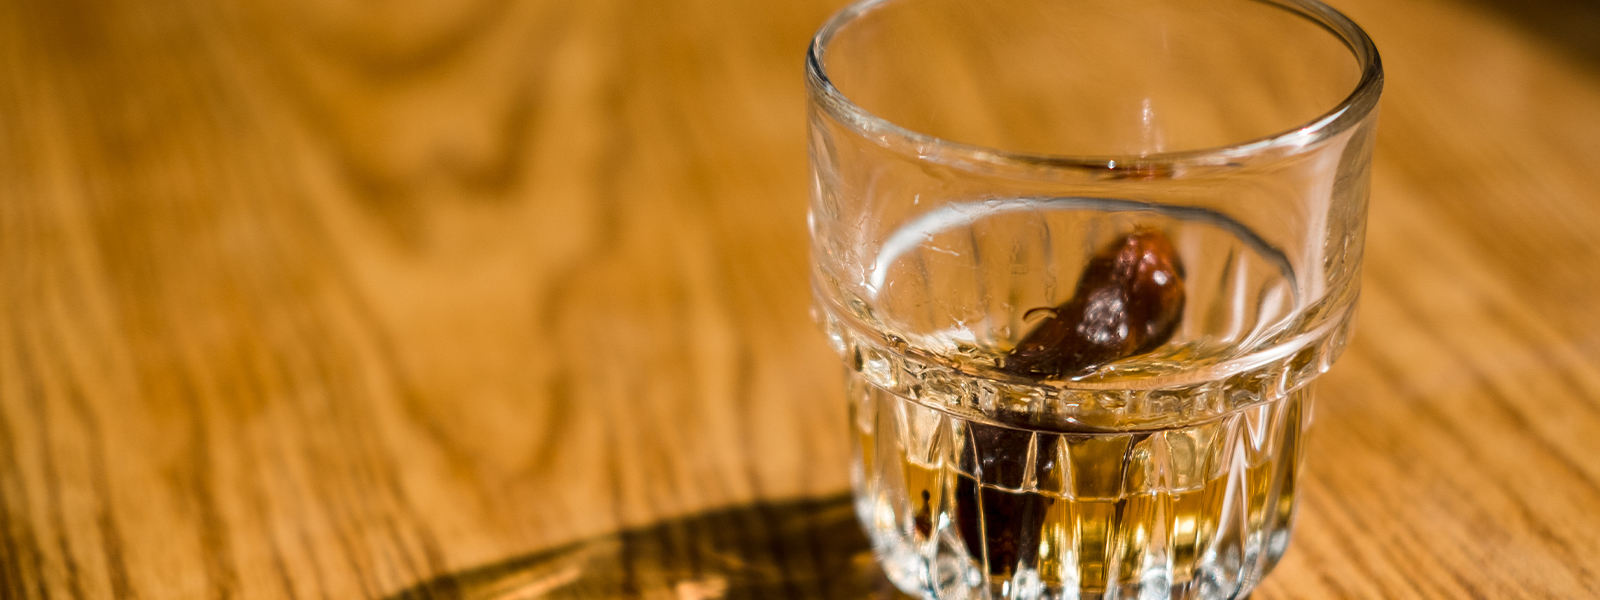 Sourtoe Cocktail